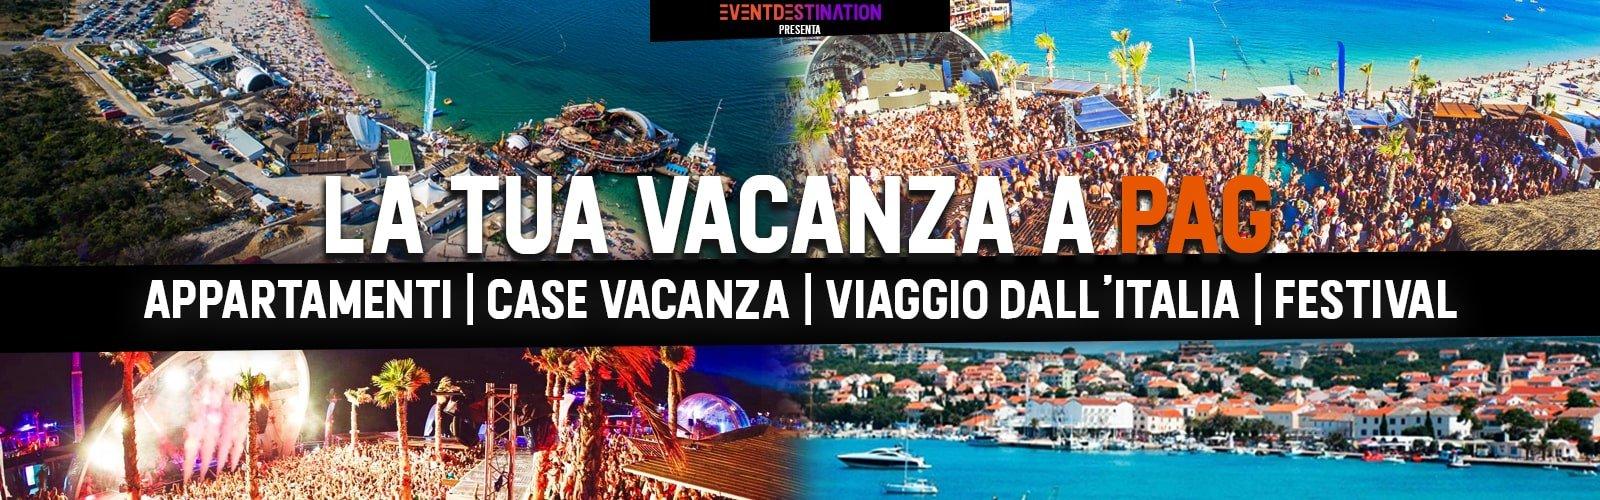 Appartamenti NOVALJA VacanZe Pag Zrce Beach Appartamenti CASE VACANZA